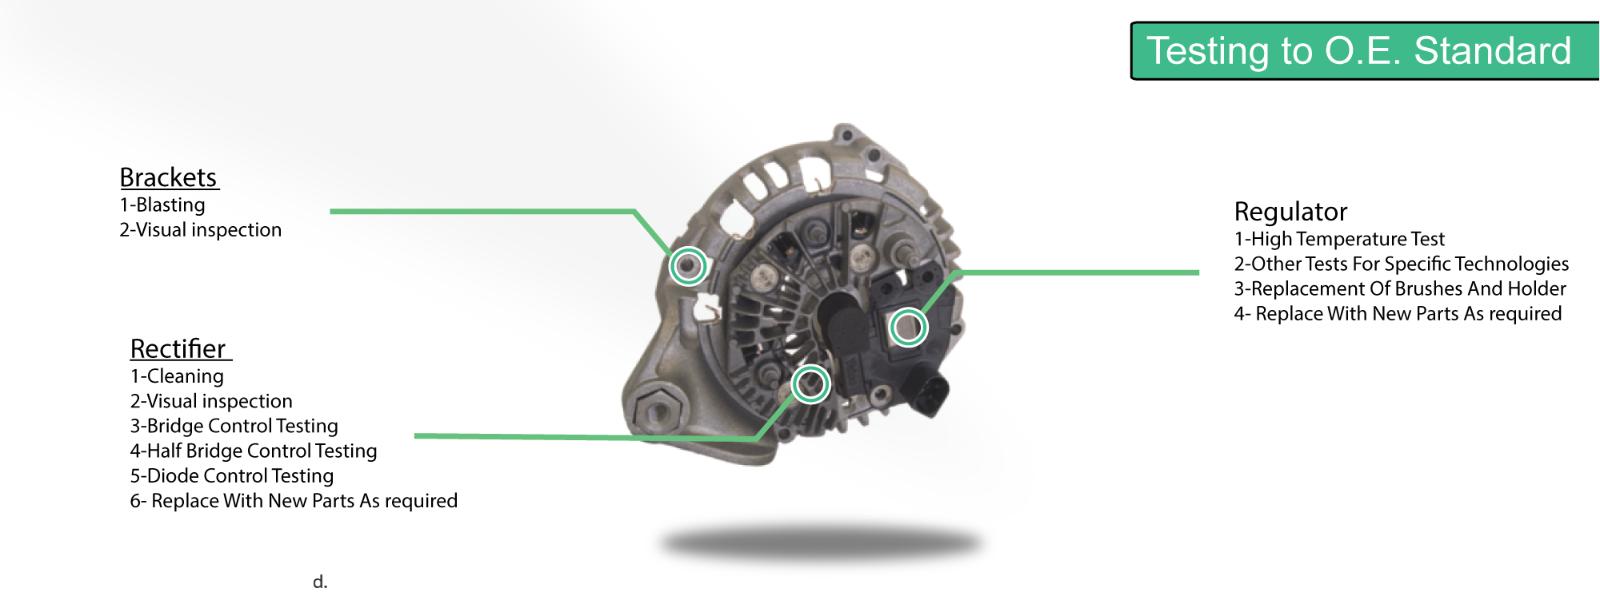 Fuel Filter Cap For Ford Kuga Focus Cmax Smax /&Fiesta 1.4 1.6 TDCI 2.0